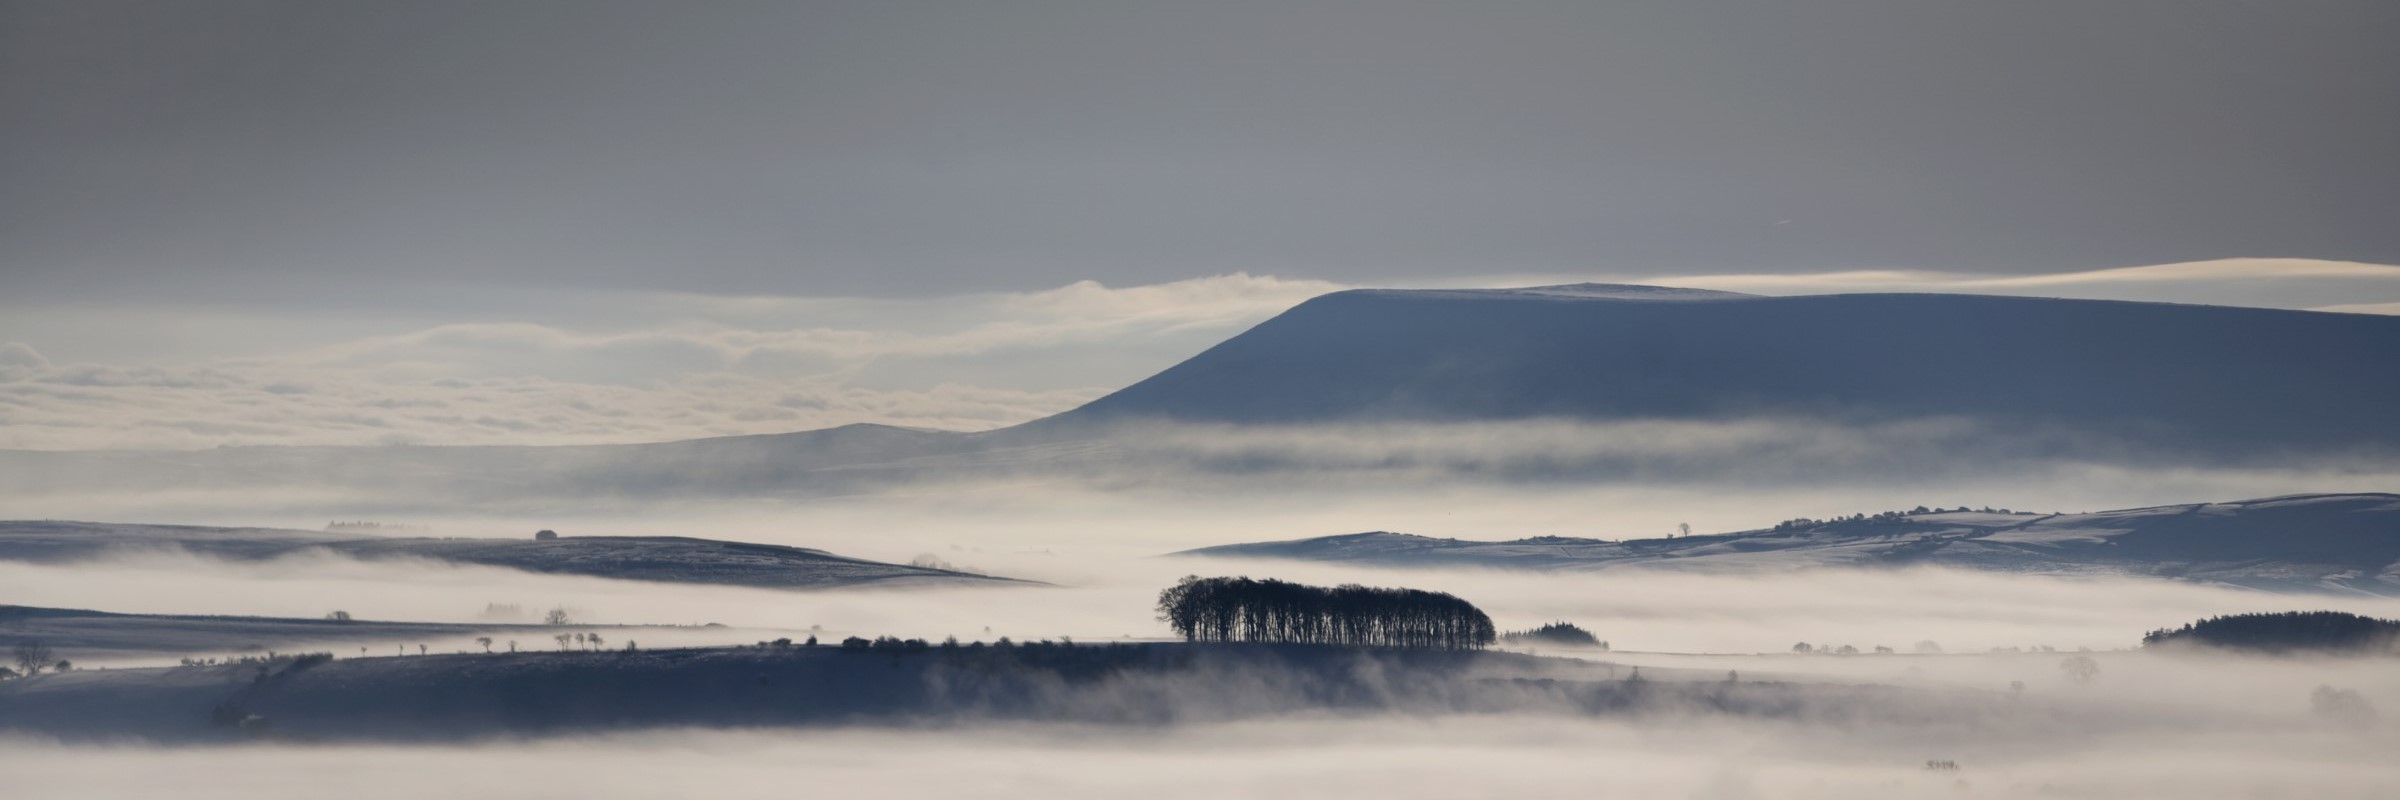 Helen Shaw, RibbleValley, Lancashire UK, Photography